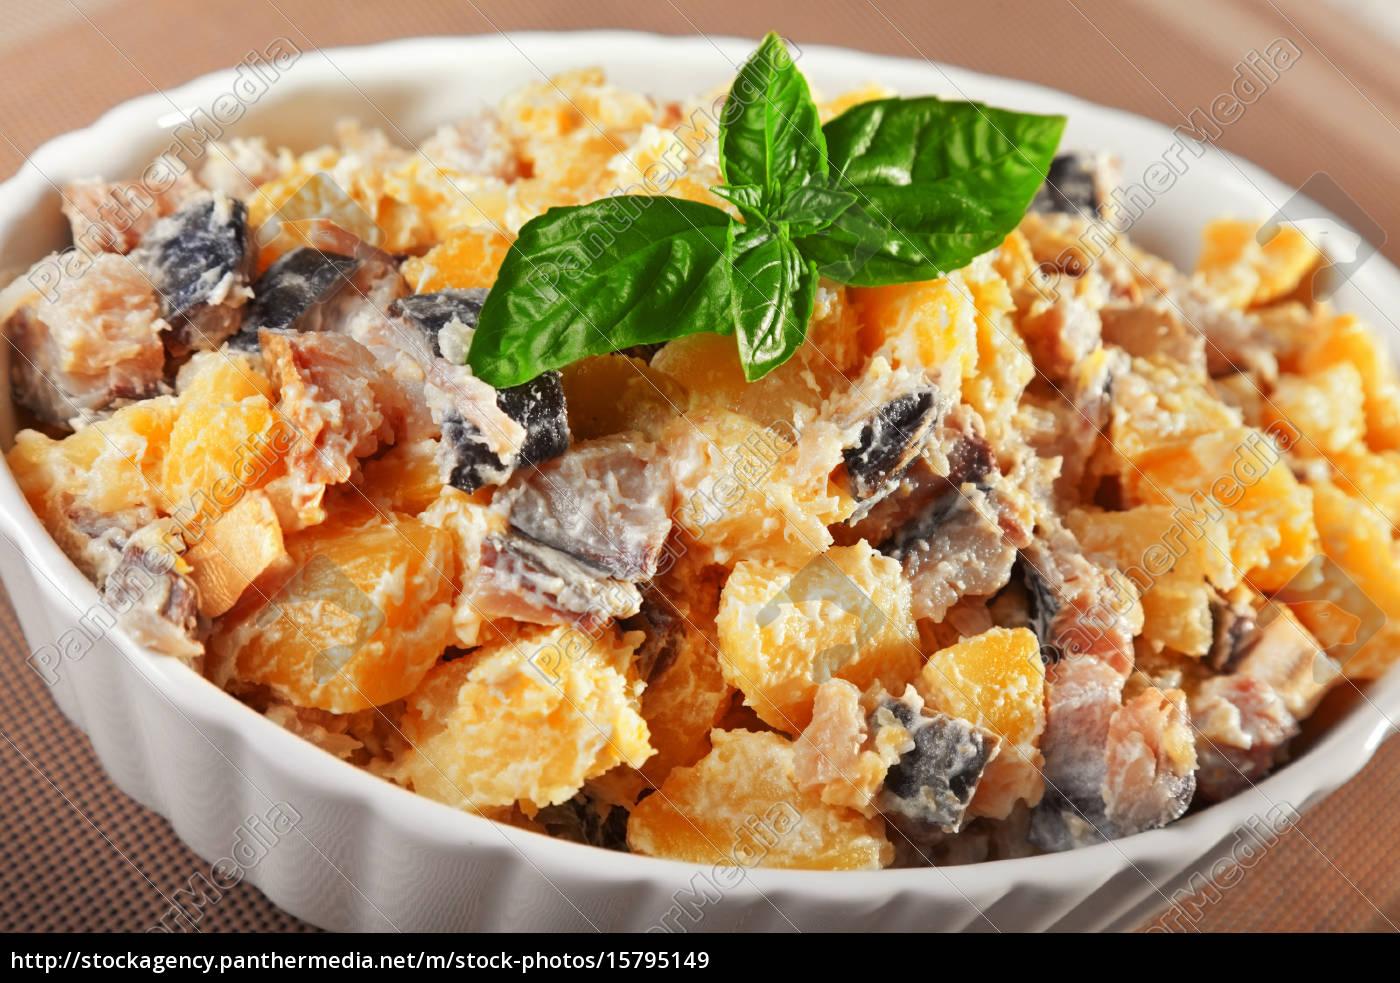 potato, salad, with, marinated, fish, potato, salad - 15795149